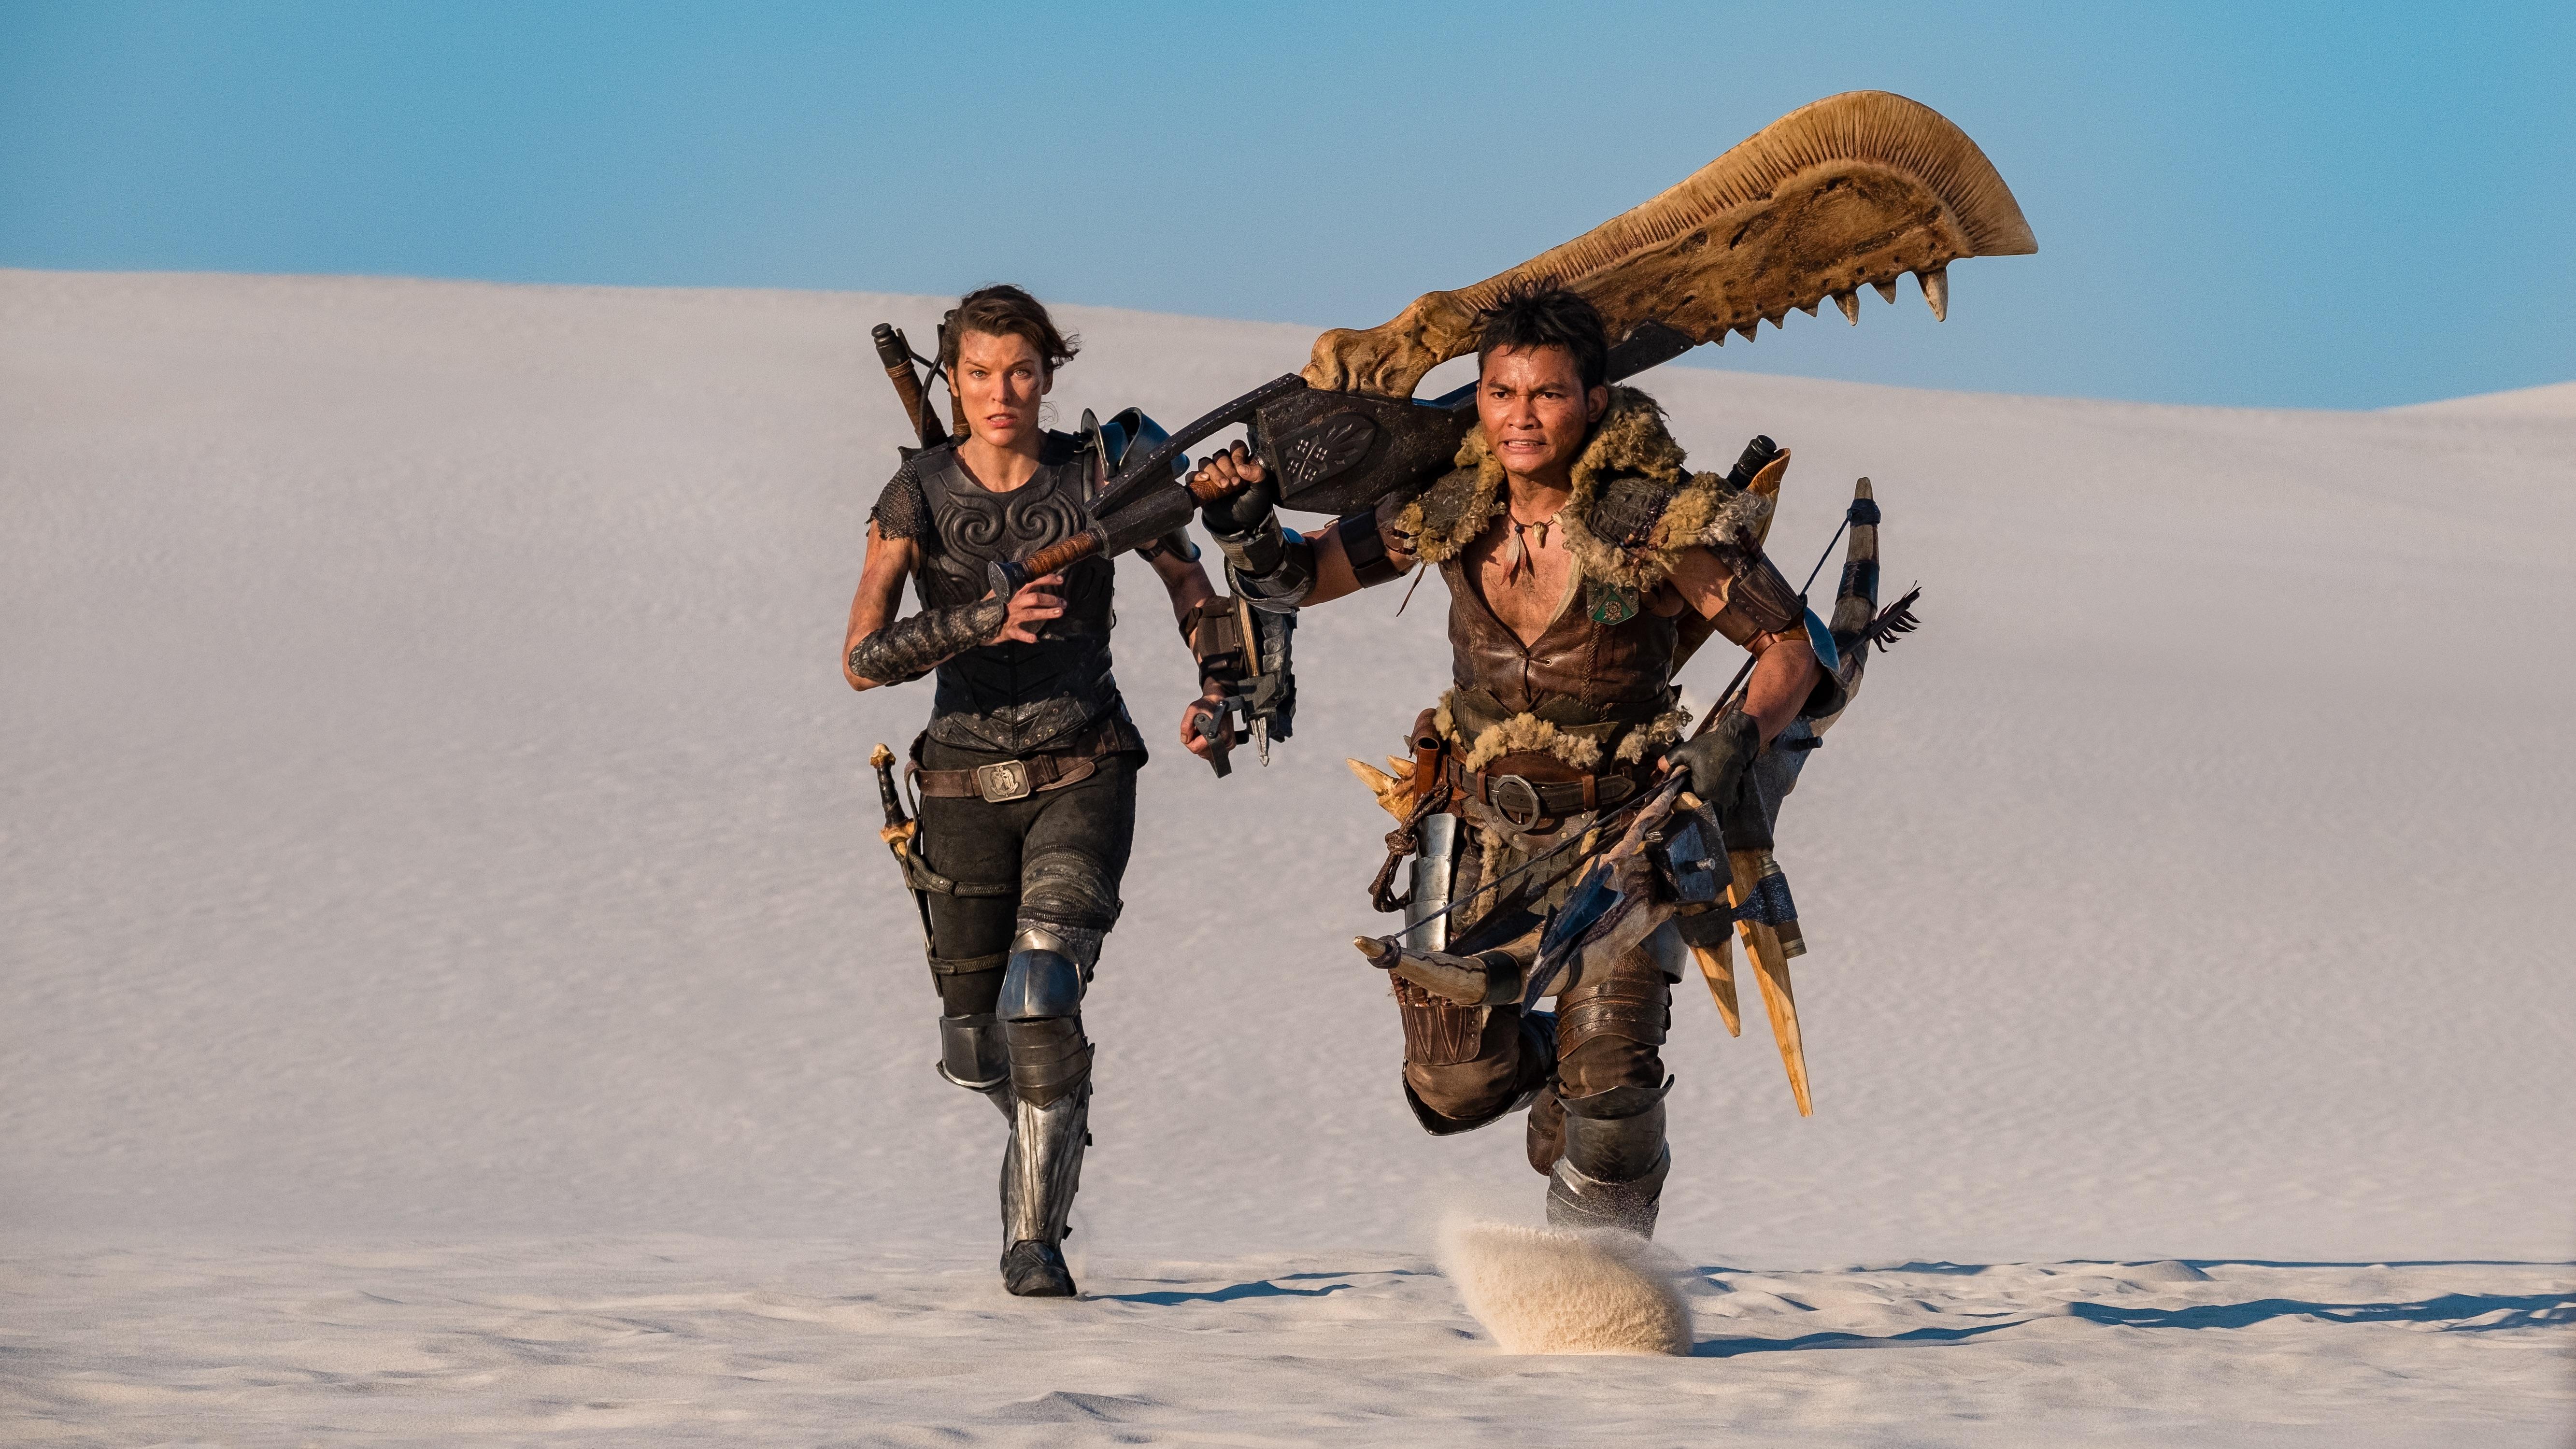 Monster Hunter Review Milla Jovovich And Tony Jaa Fight Cg Beasties Variety